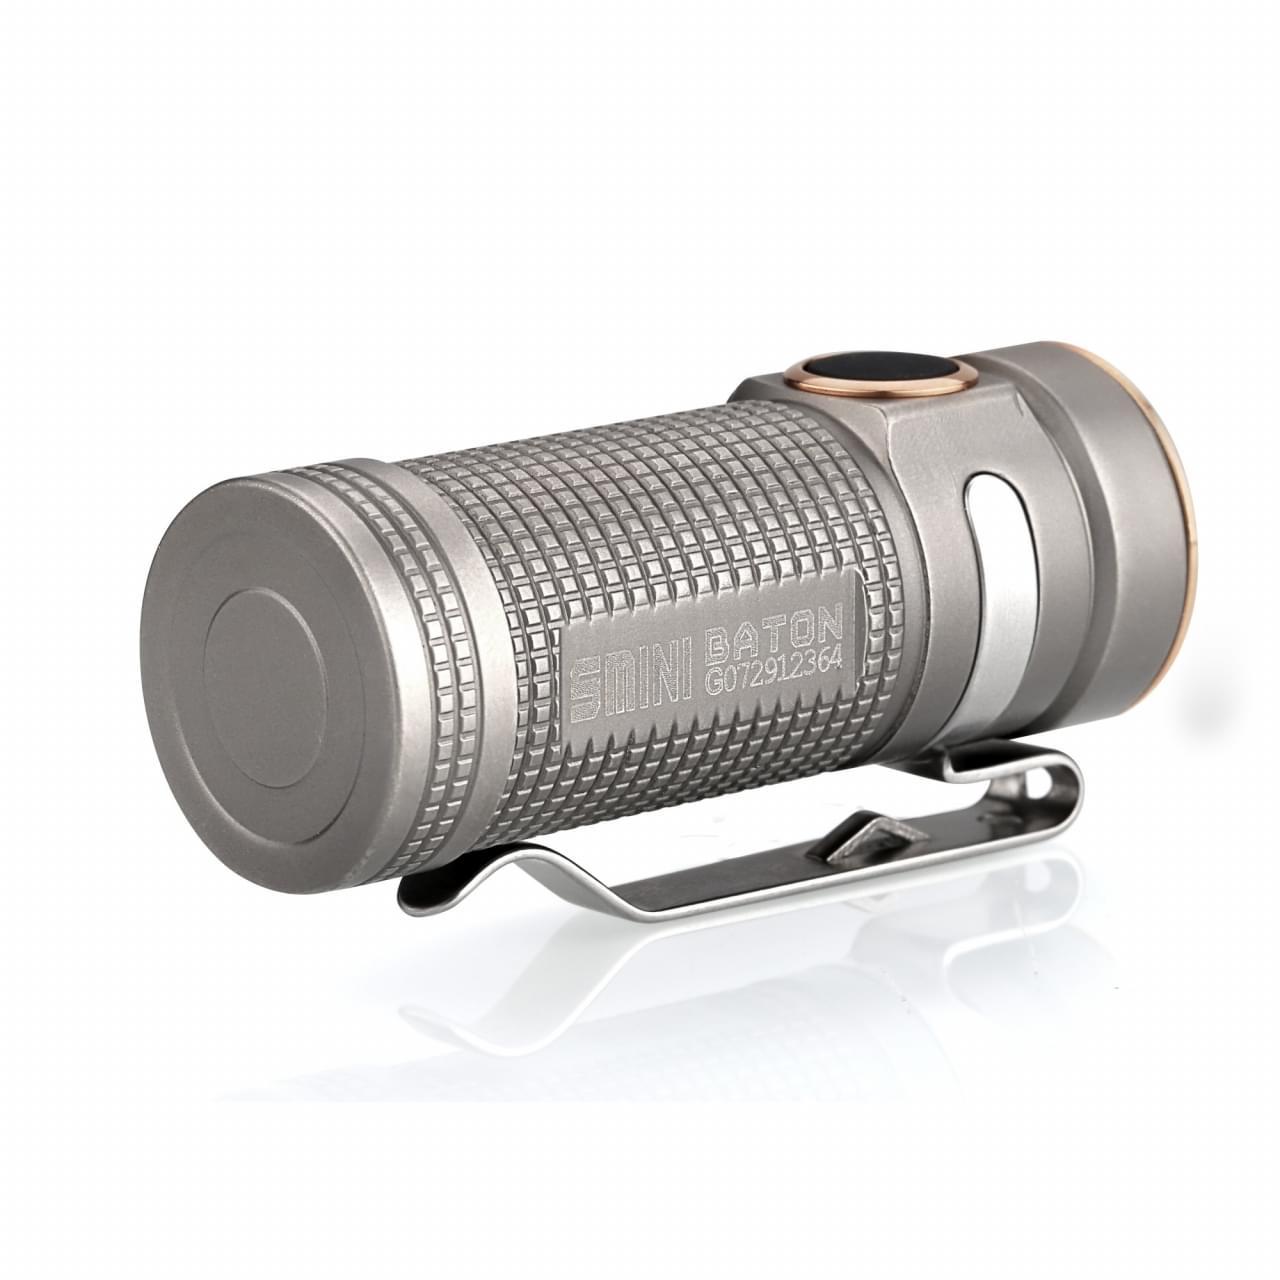 Olight SMINI Baton TI - Bead Blasted Limited edition